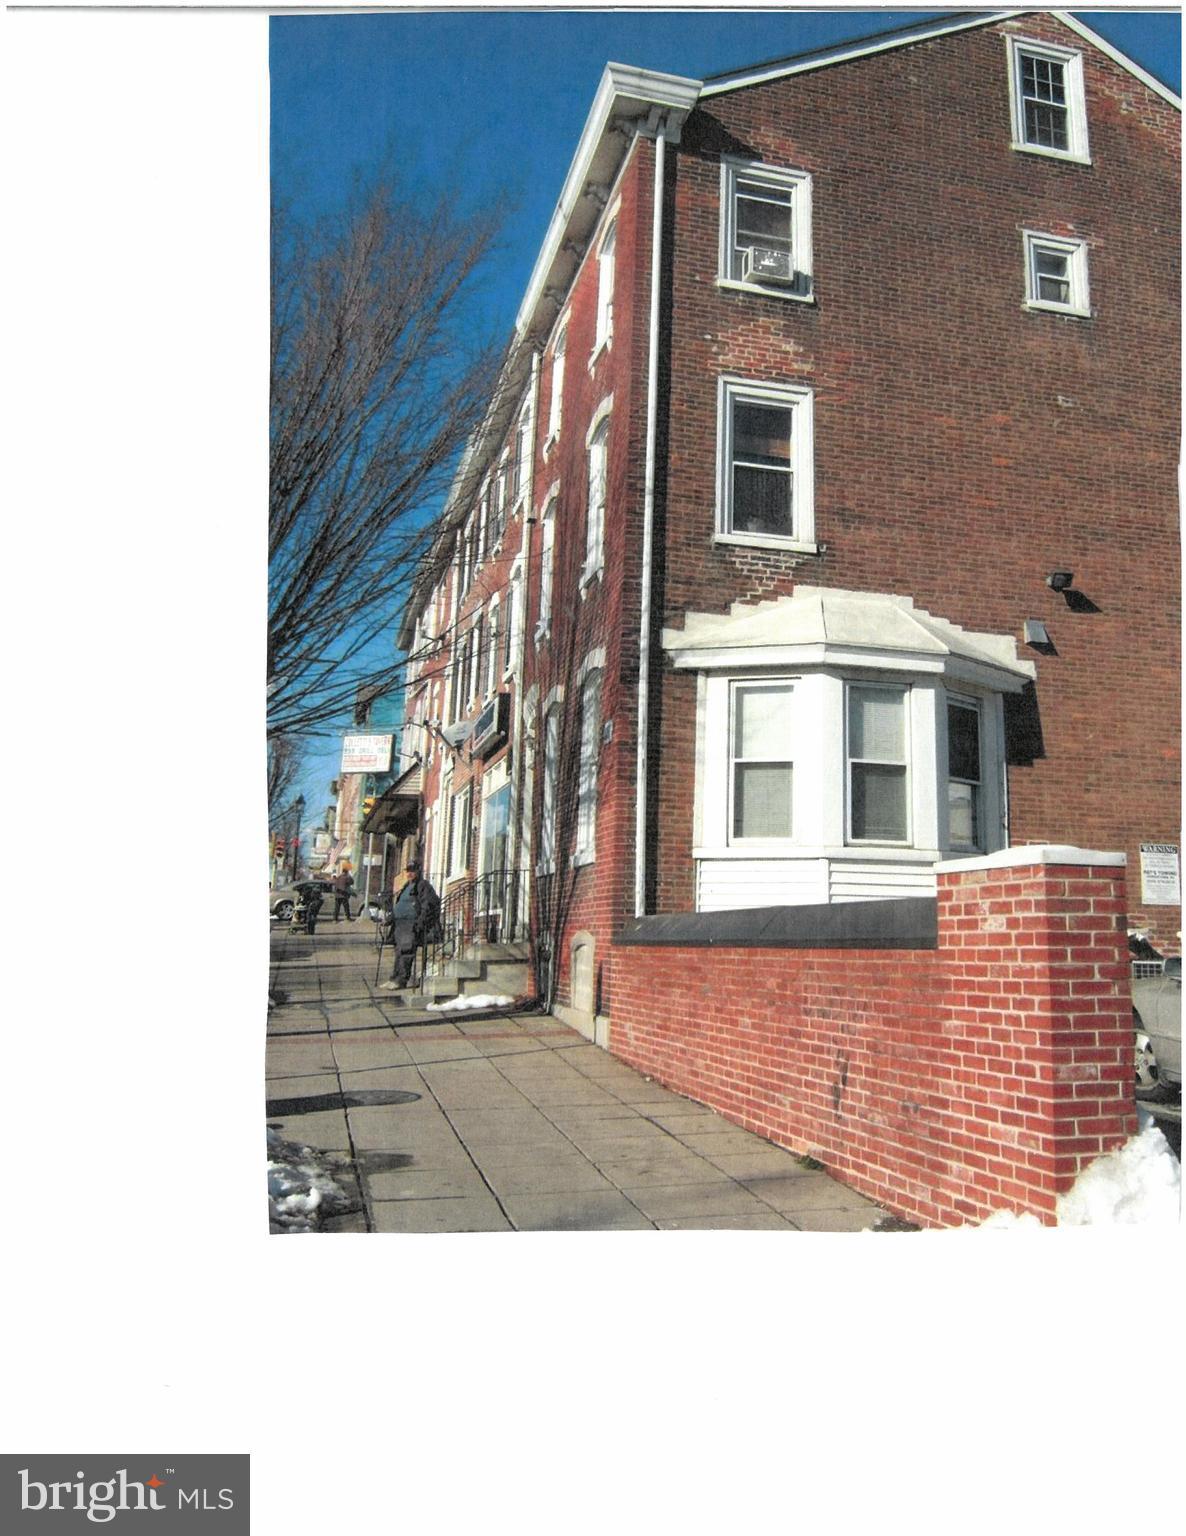 335 W MARSHALL STREET W, NORRISTOWN, PA 19401